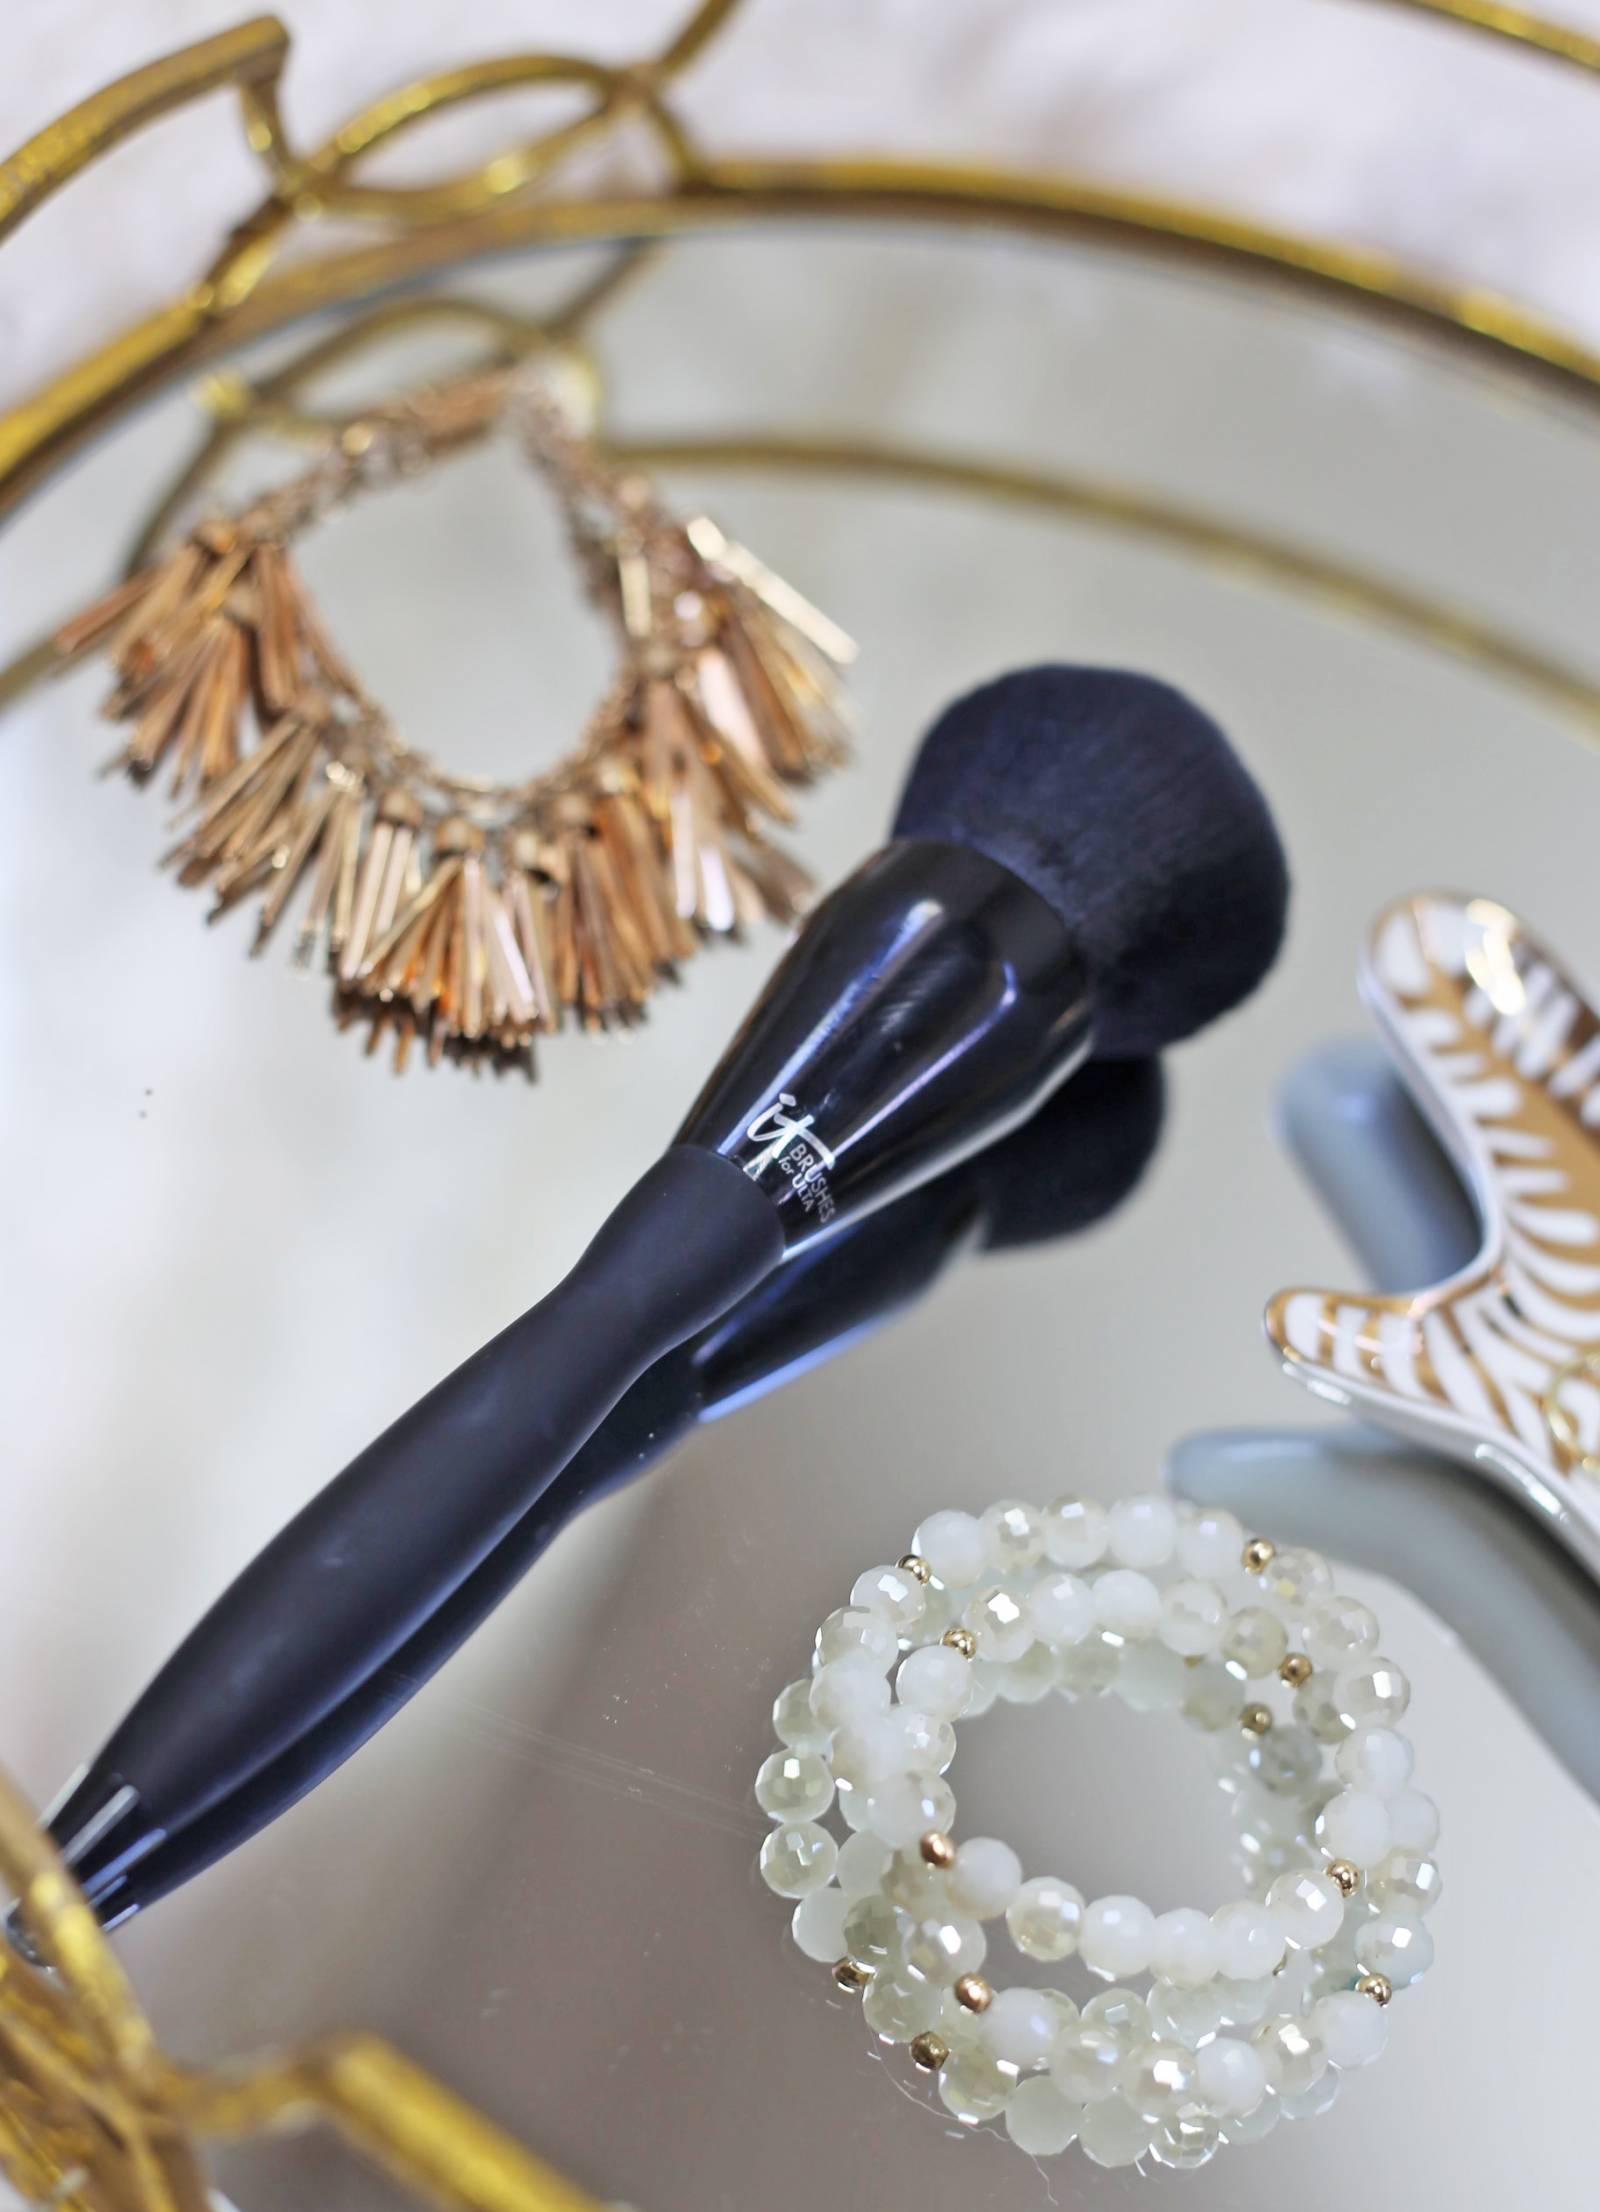 affordable blending brush   best beauty finds from ulta    spring beauty favorites    mash elle beauty blogger   Ulta makeup   naked   hoola   clinique